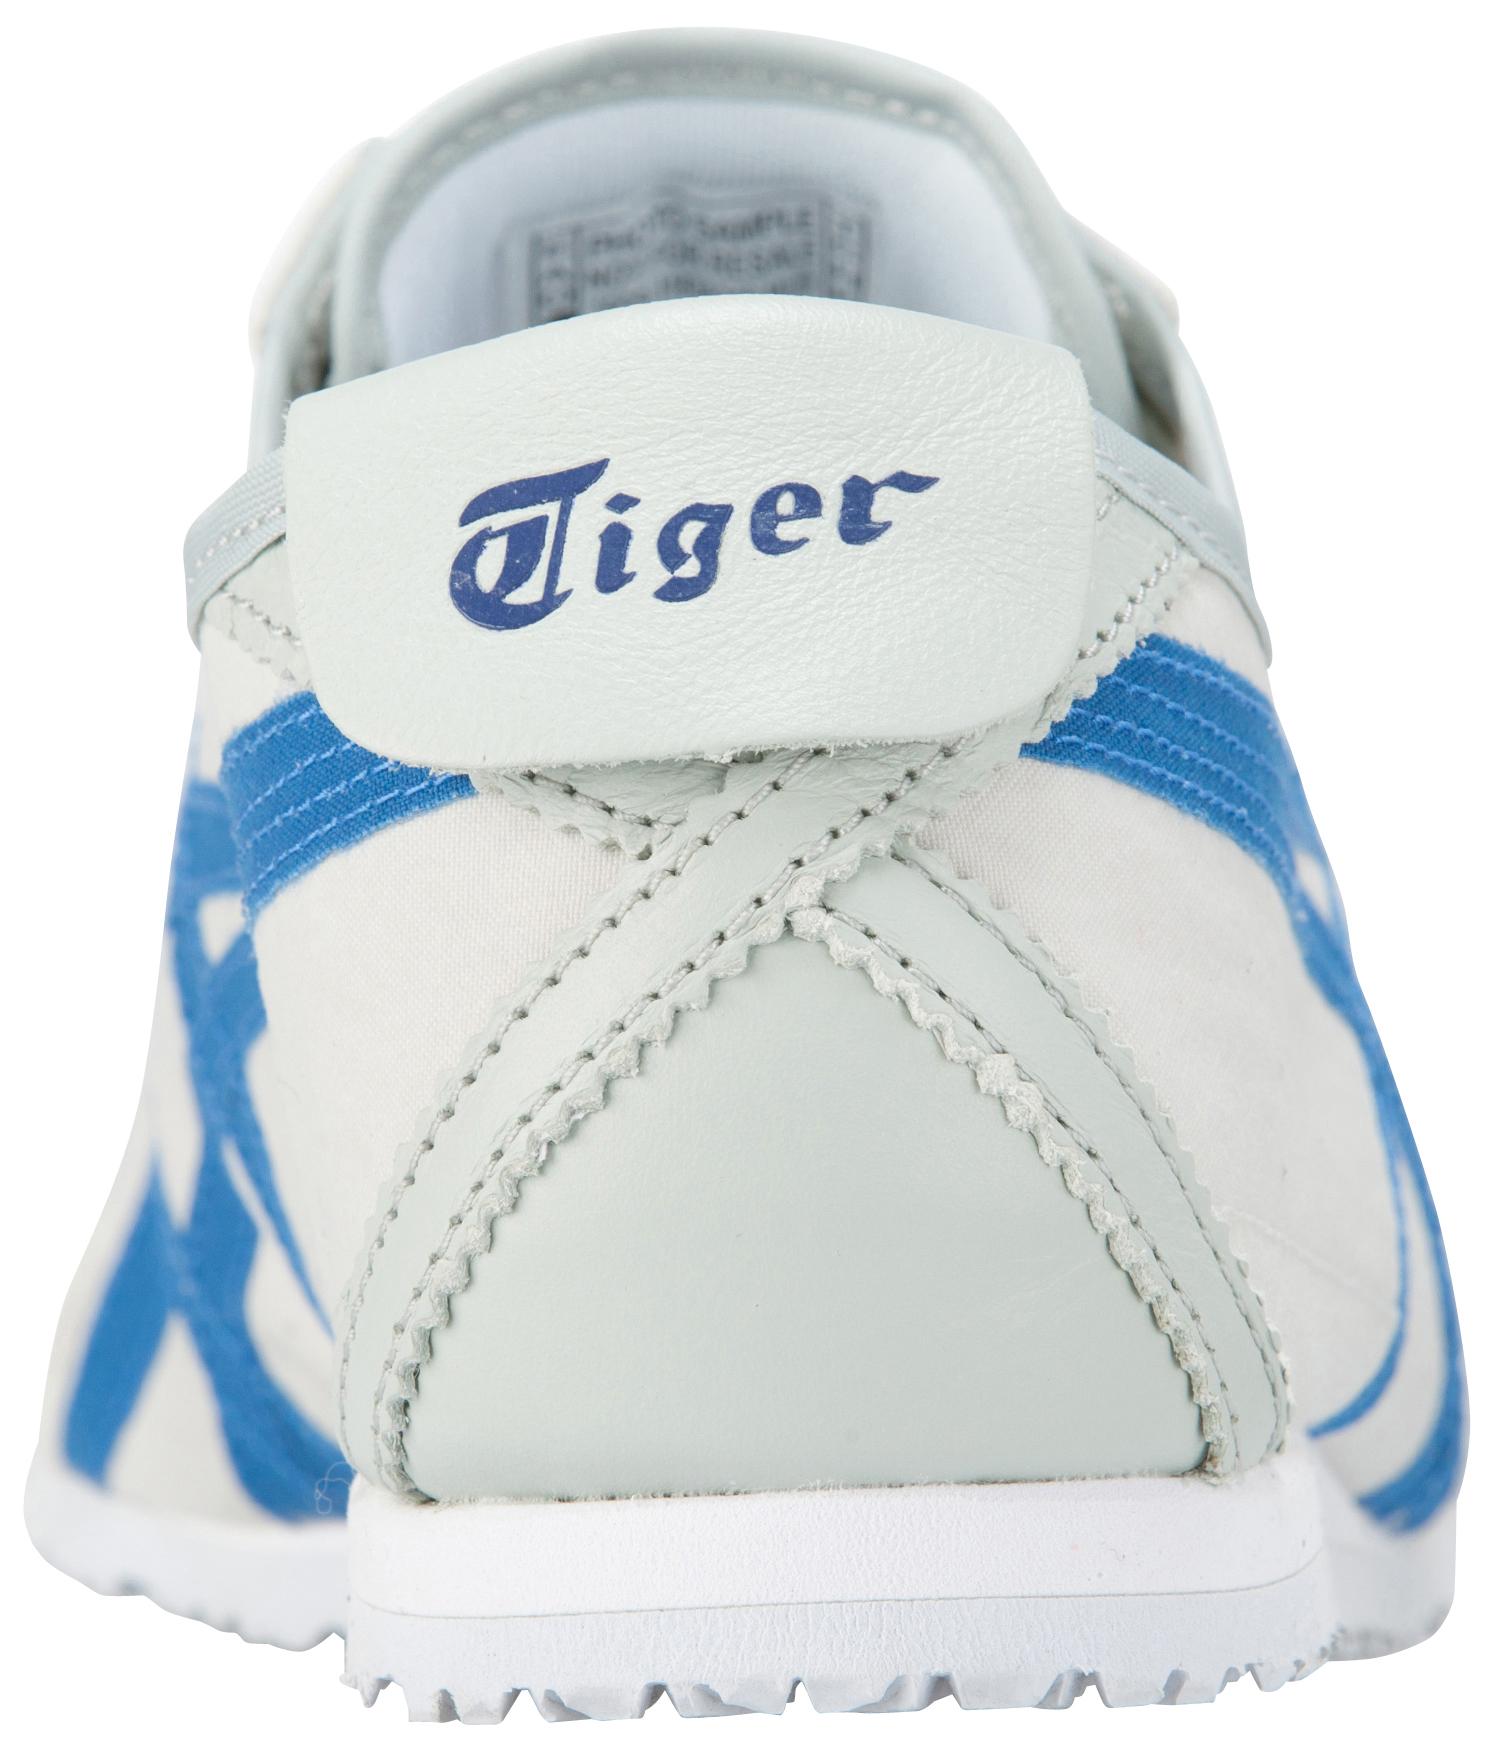 66 Chaussures Tiger Mexico De Onitsuka UnisexeMec Rj5Lq34cA